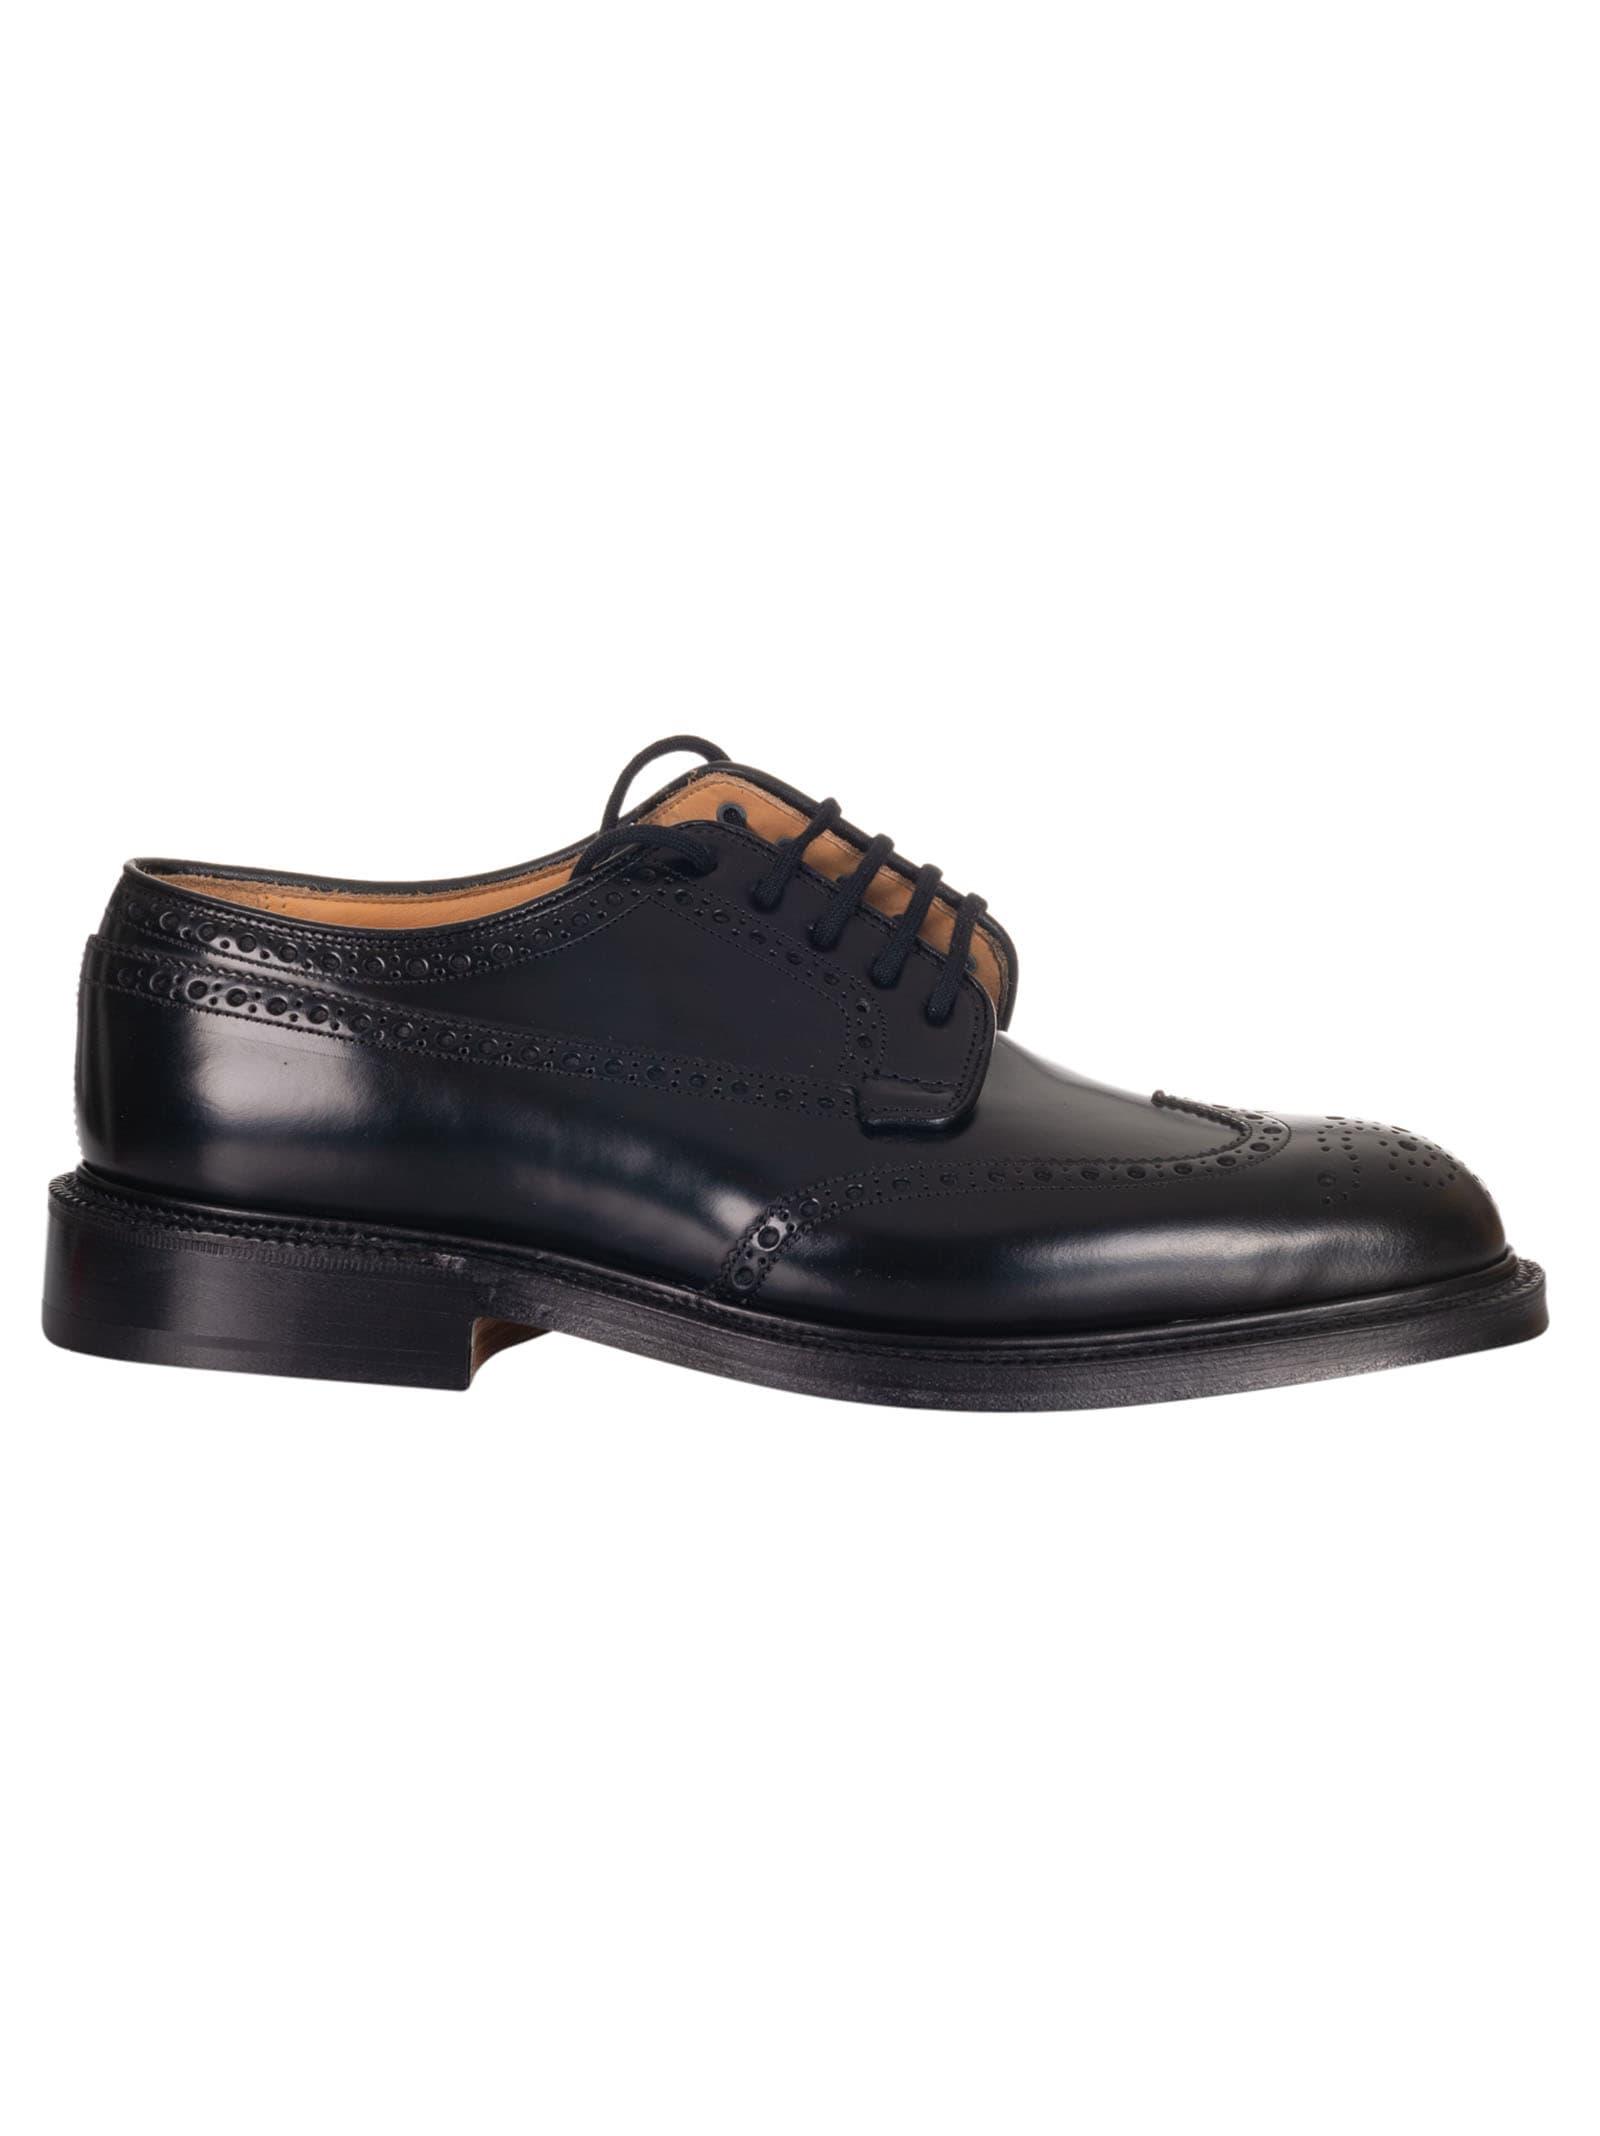 Churchs Grafton Oxford Shoes